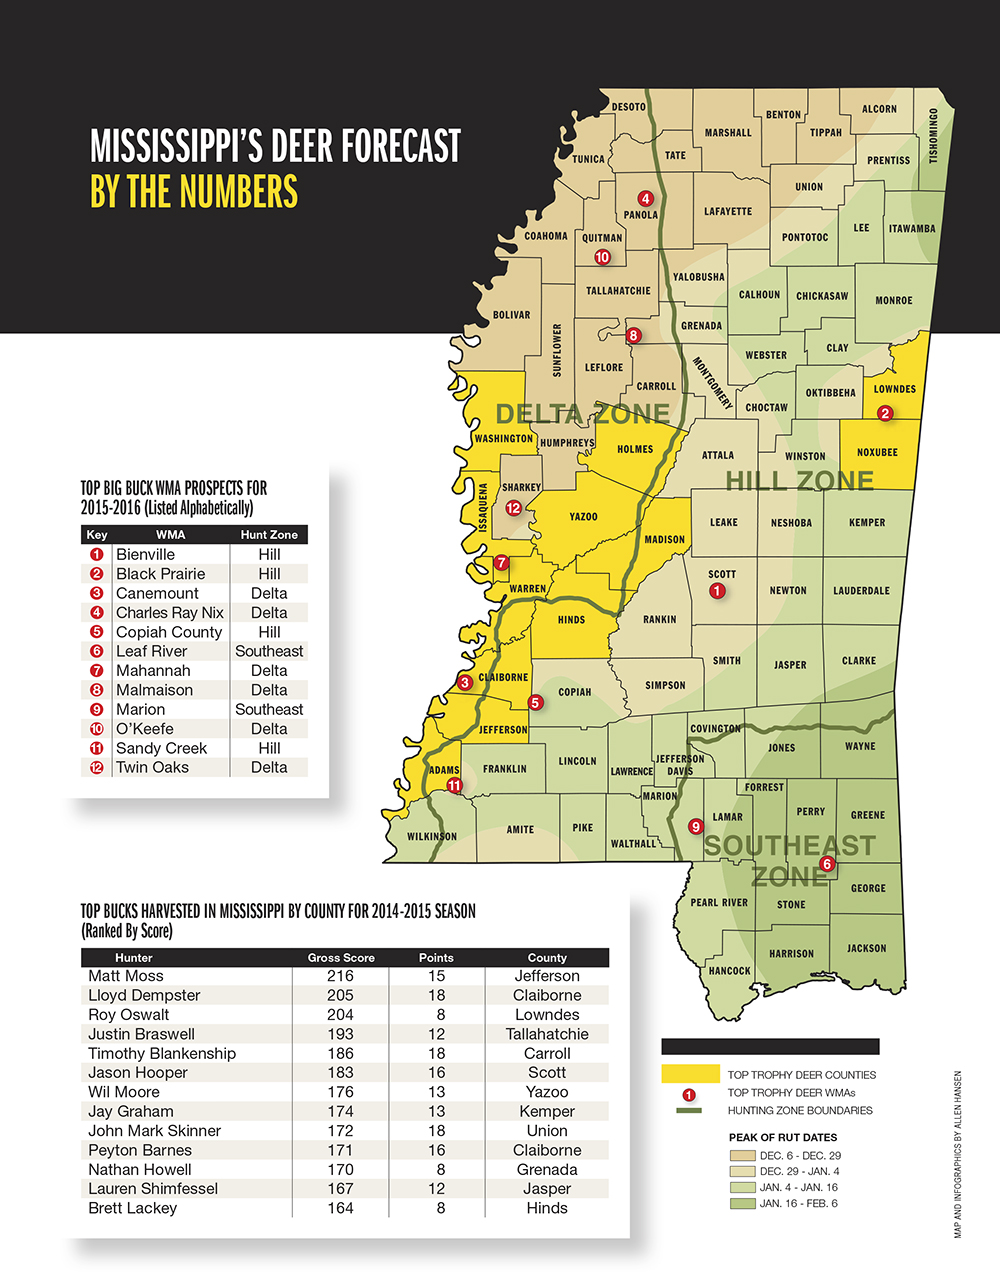 2015 Trophy Deer Forecast: Louisiana